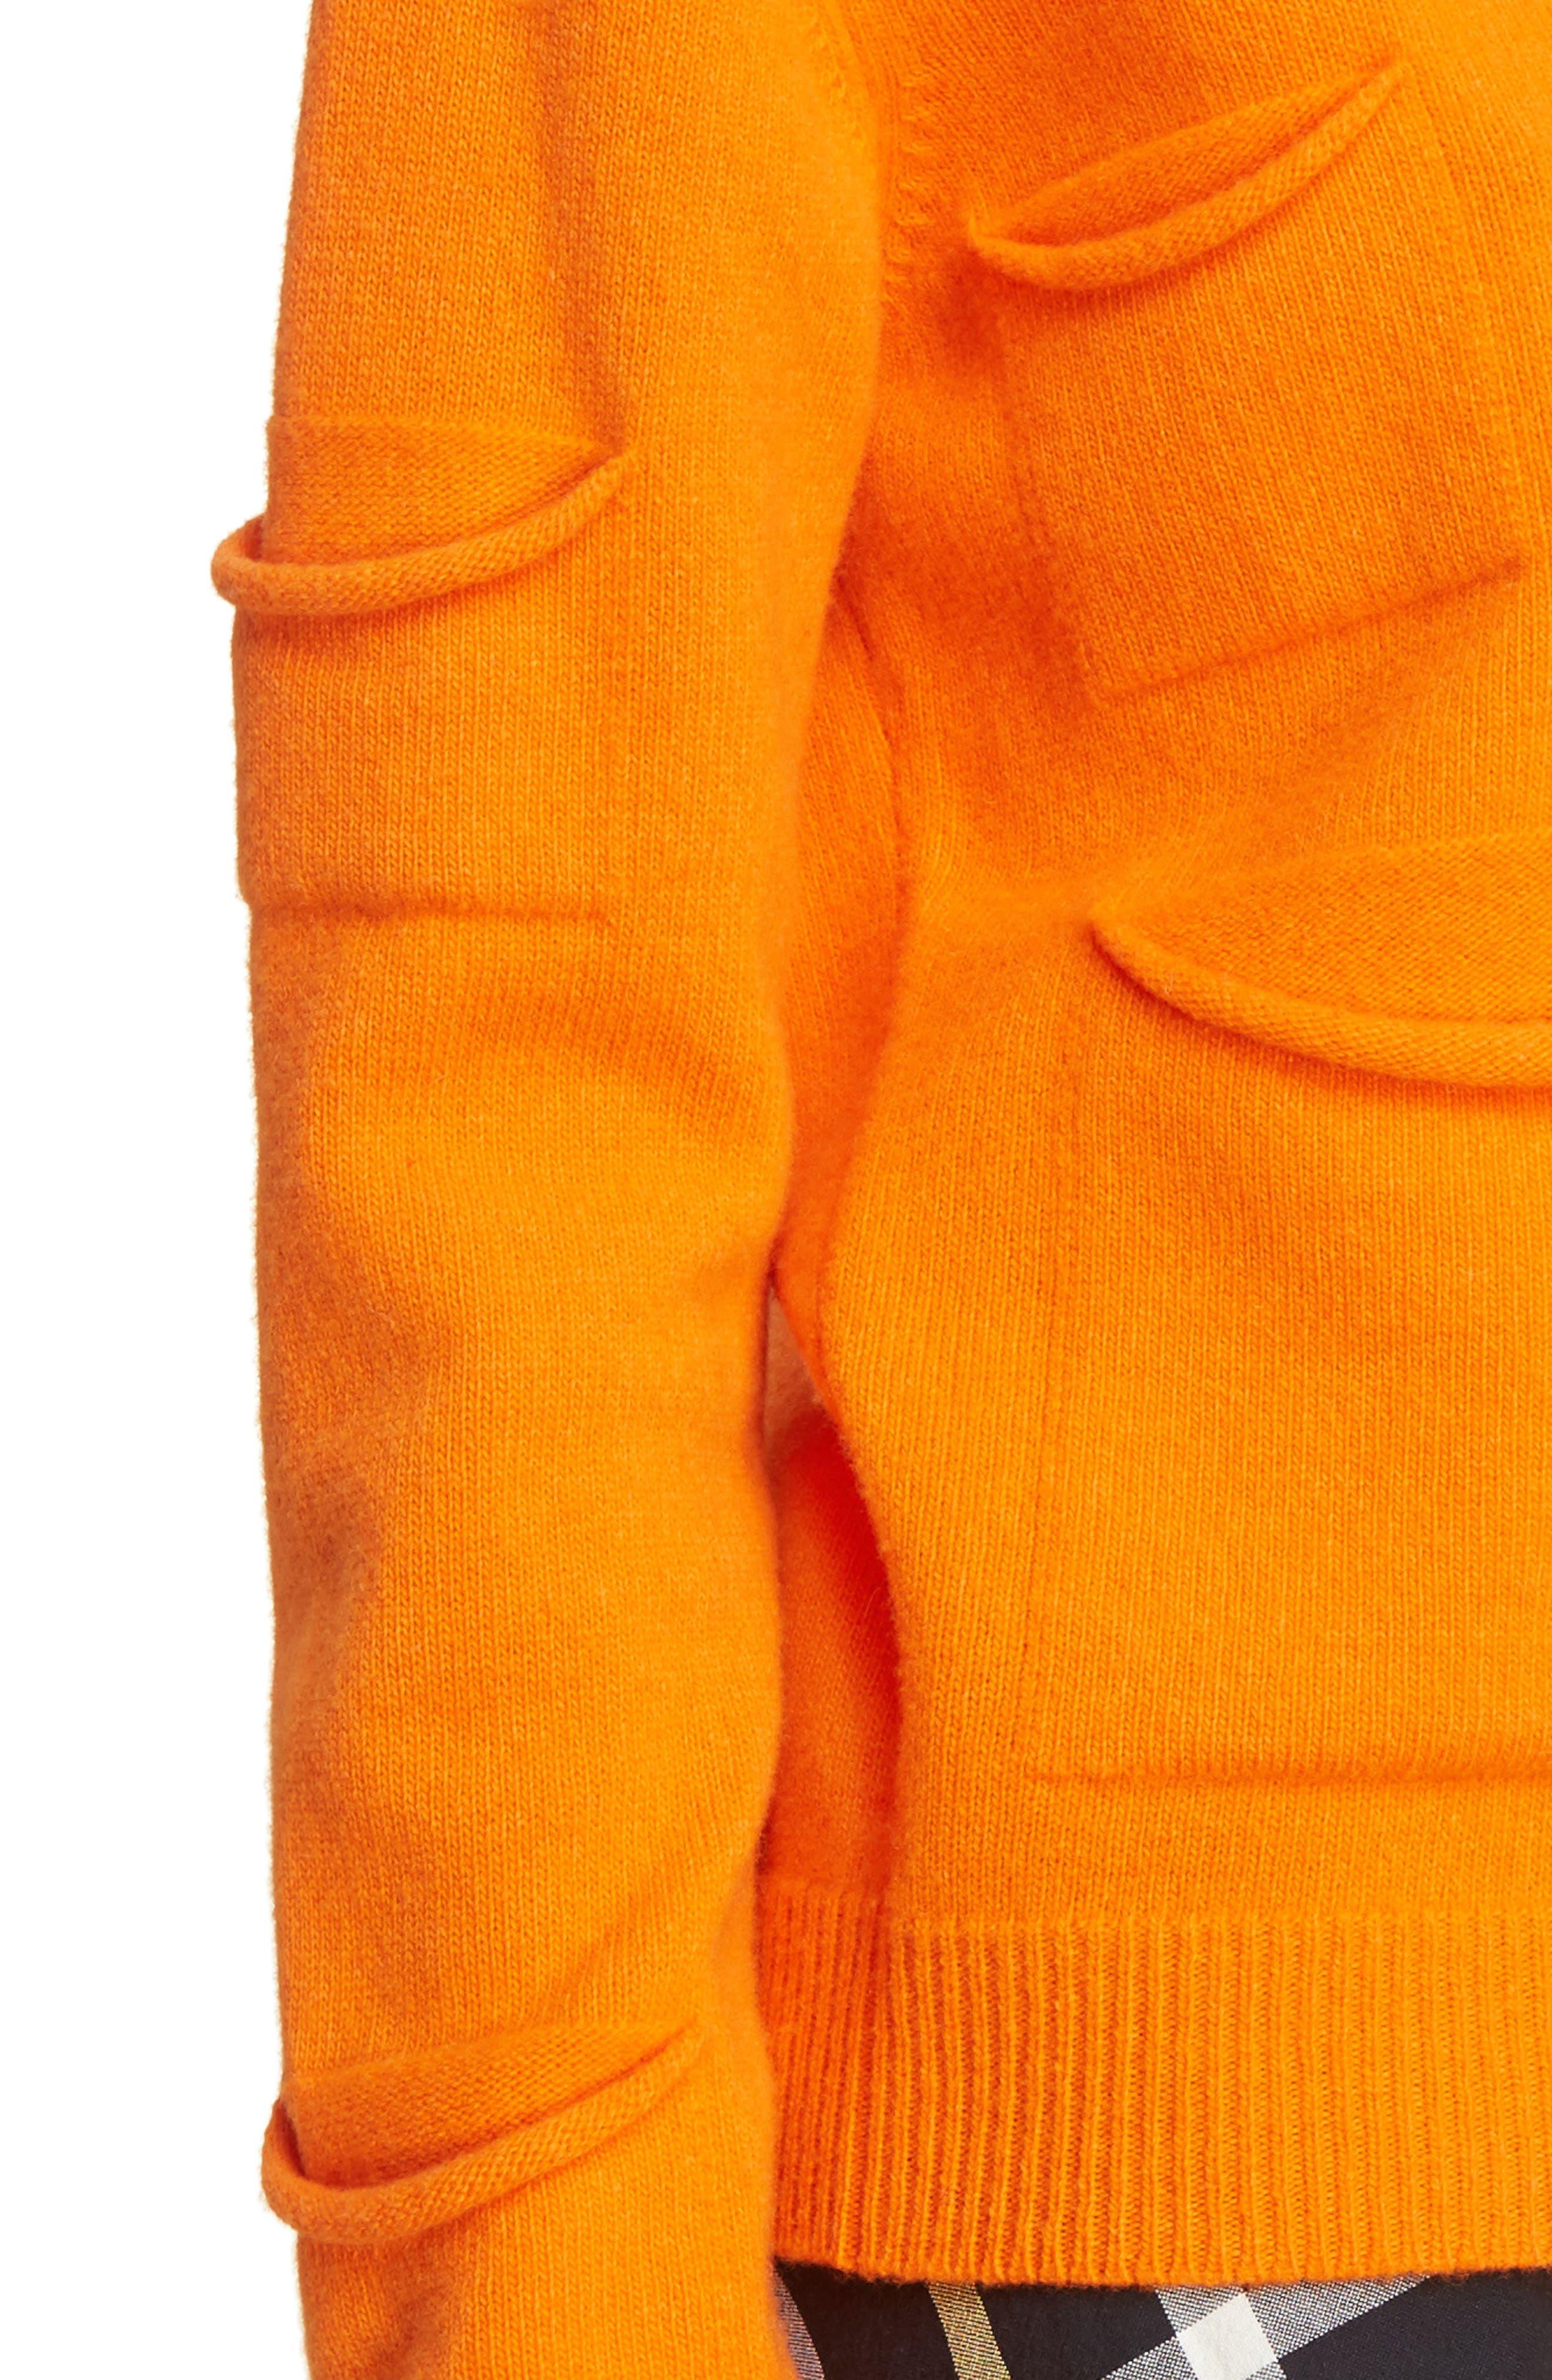 J.W.ANDERSON Multi Pocket Crewneck Sweater,                             Alternate thumbnail 5, color,                             Tangerine